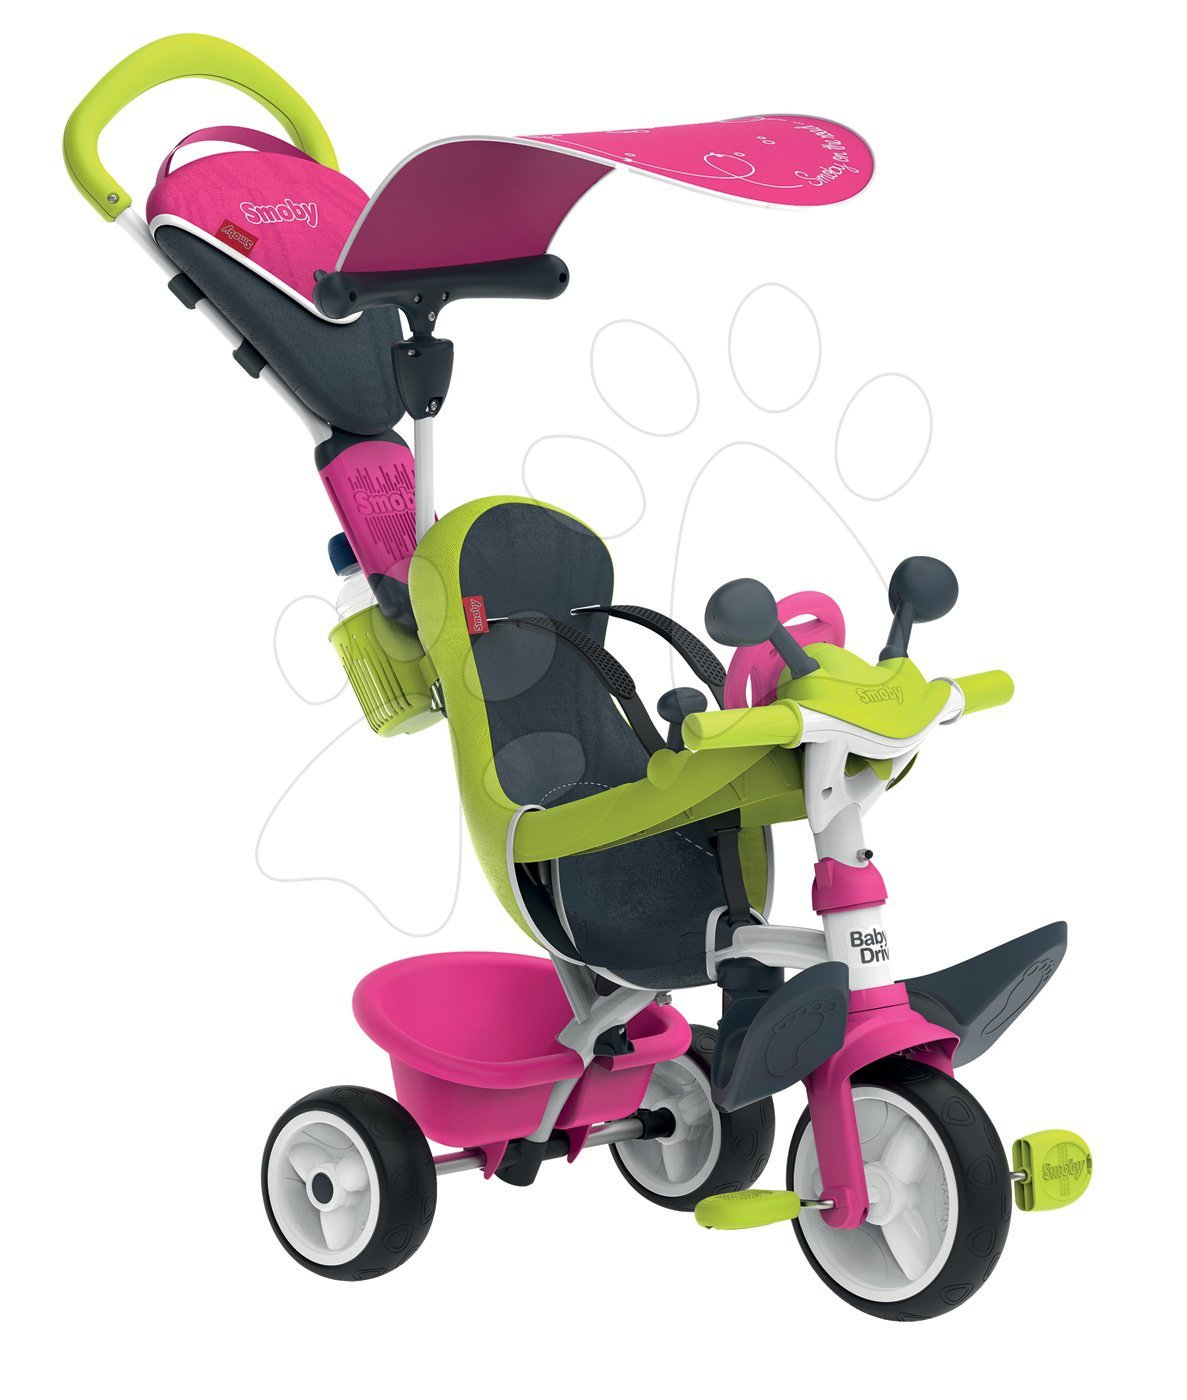 Smoby trojkolka s poťahom Baby Driver Comfort Pink s Eva kolesami 741201